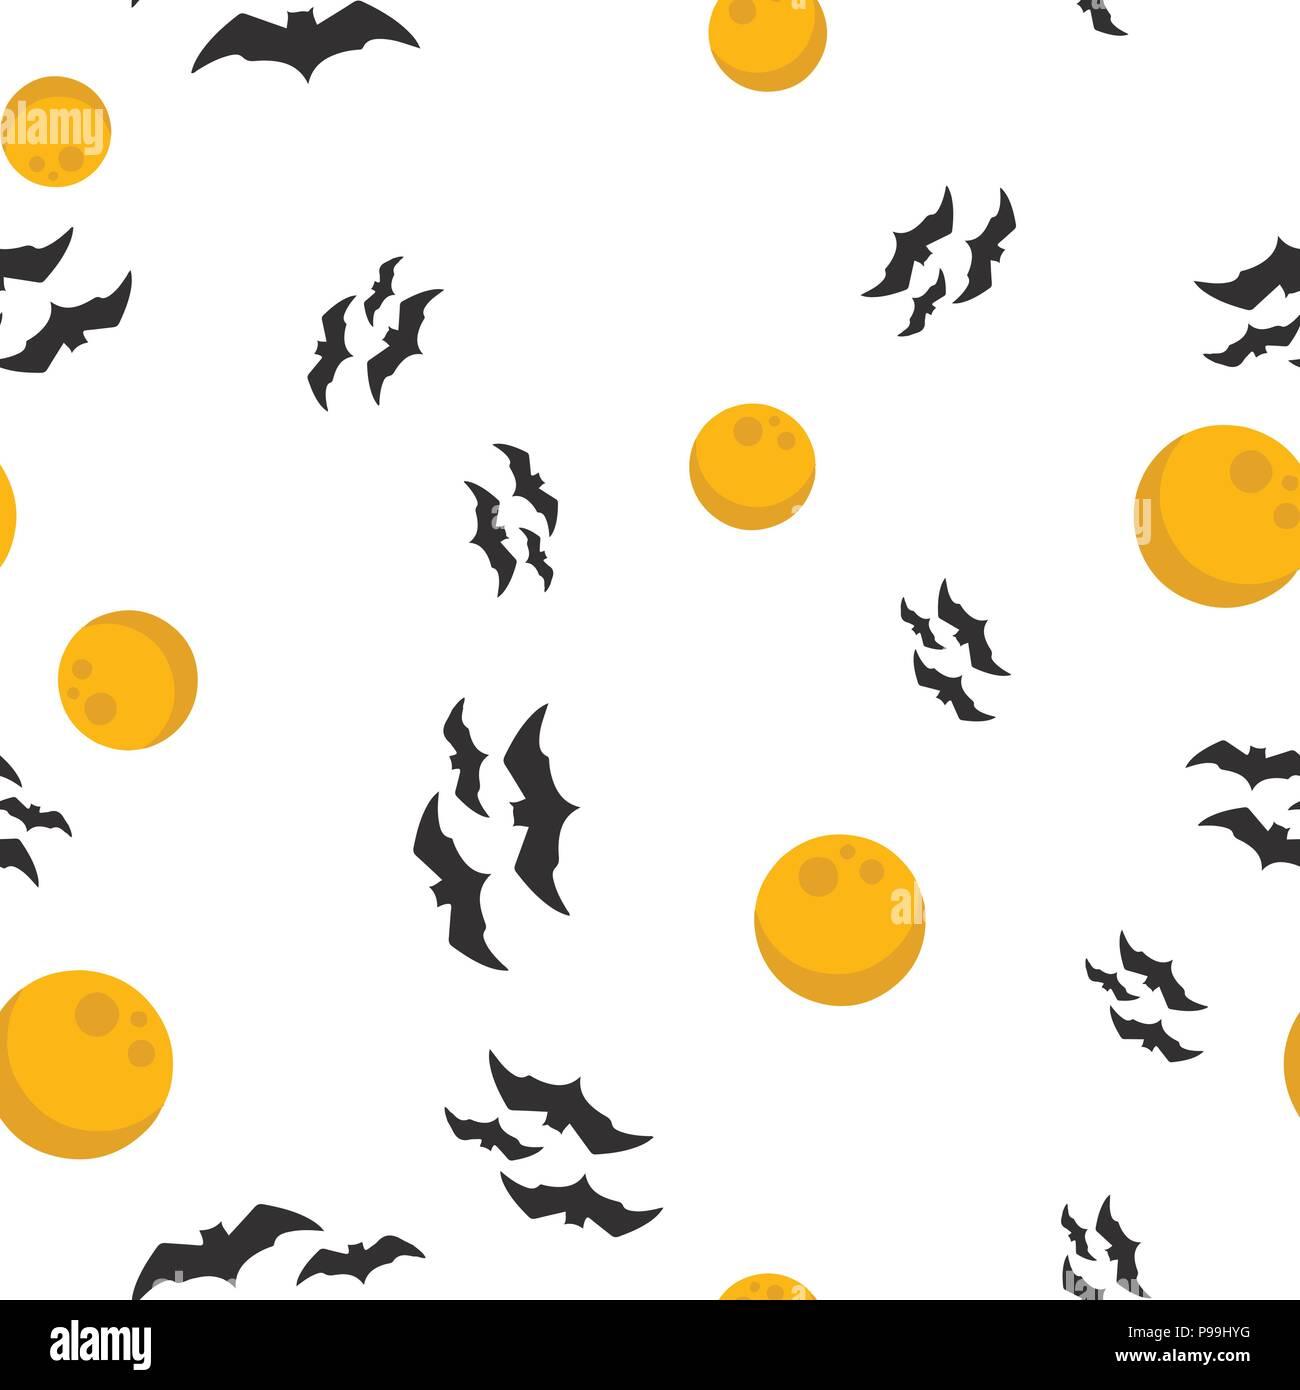 Full moon, bat Halloween pattern seamless. Vector illustration. Isolated white background. All Saints Eve. - Stock Image